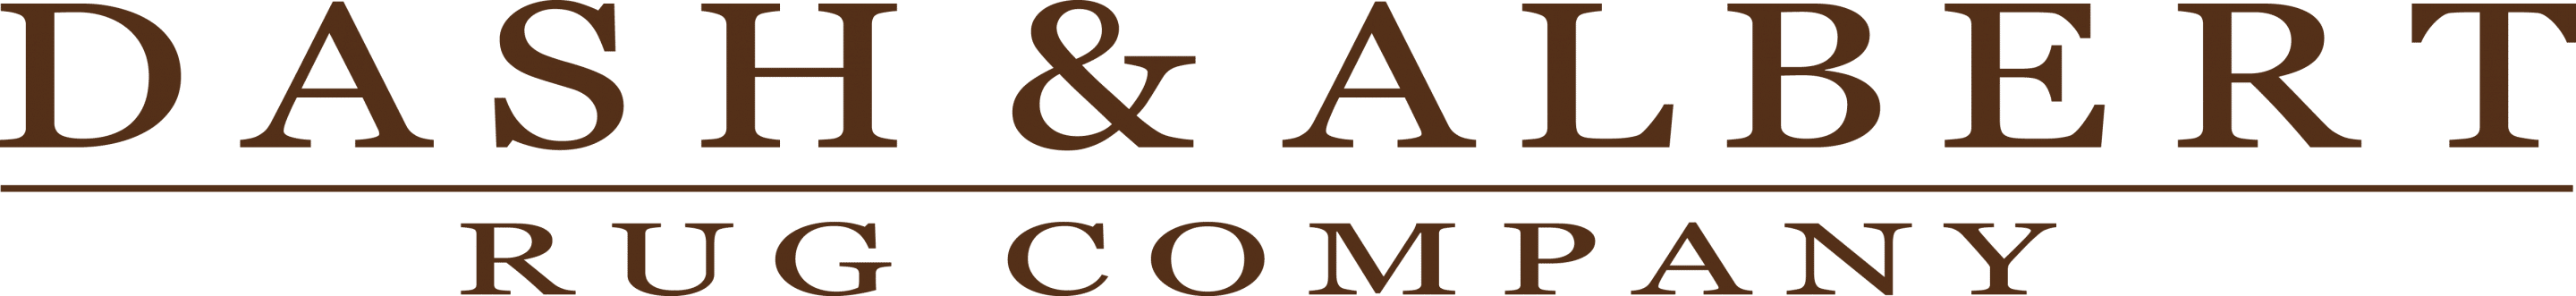 Dash & Lambert Area Rugs Plymouth MA